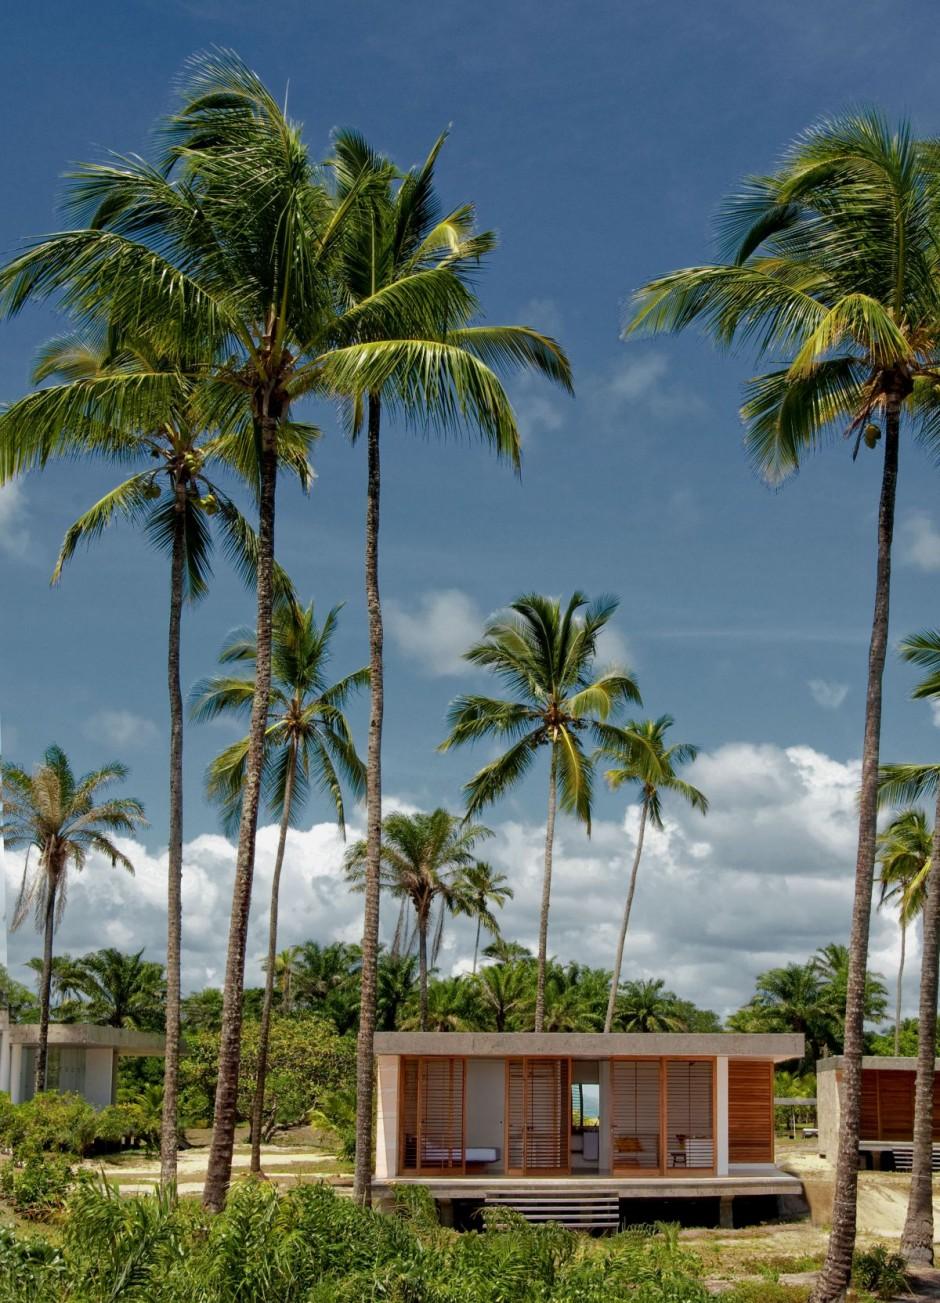 ferienhaus sommer traum mekena resort brasilien natur palmen bungalow